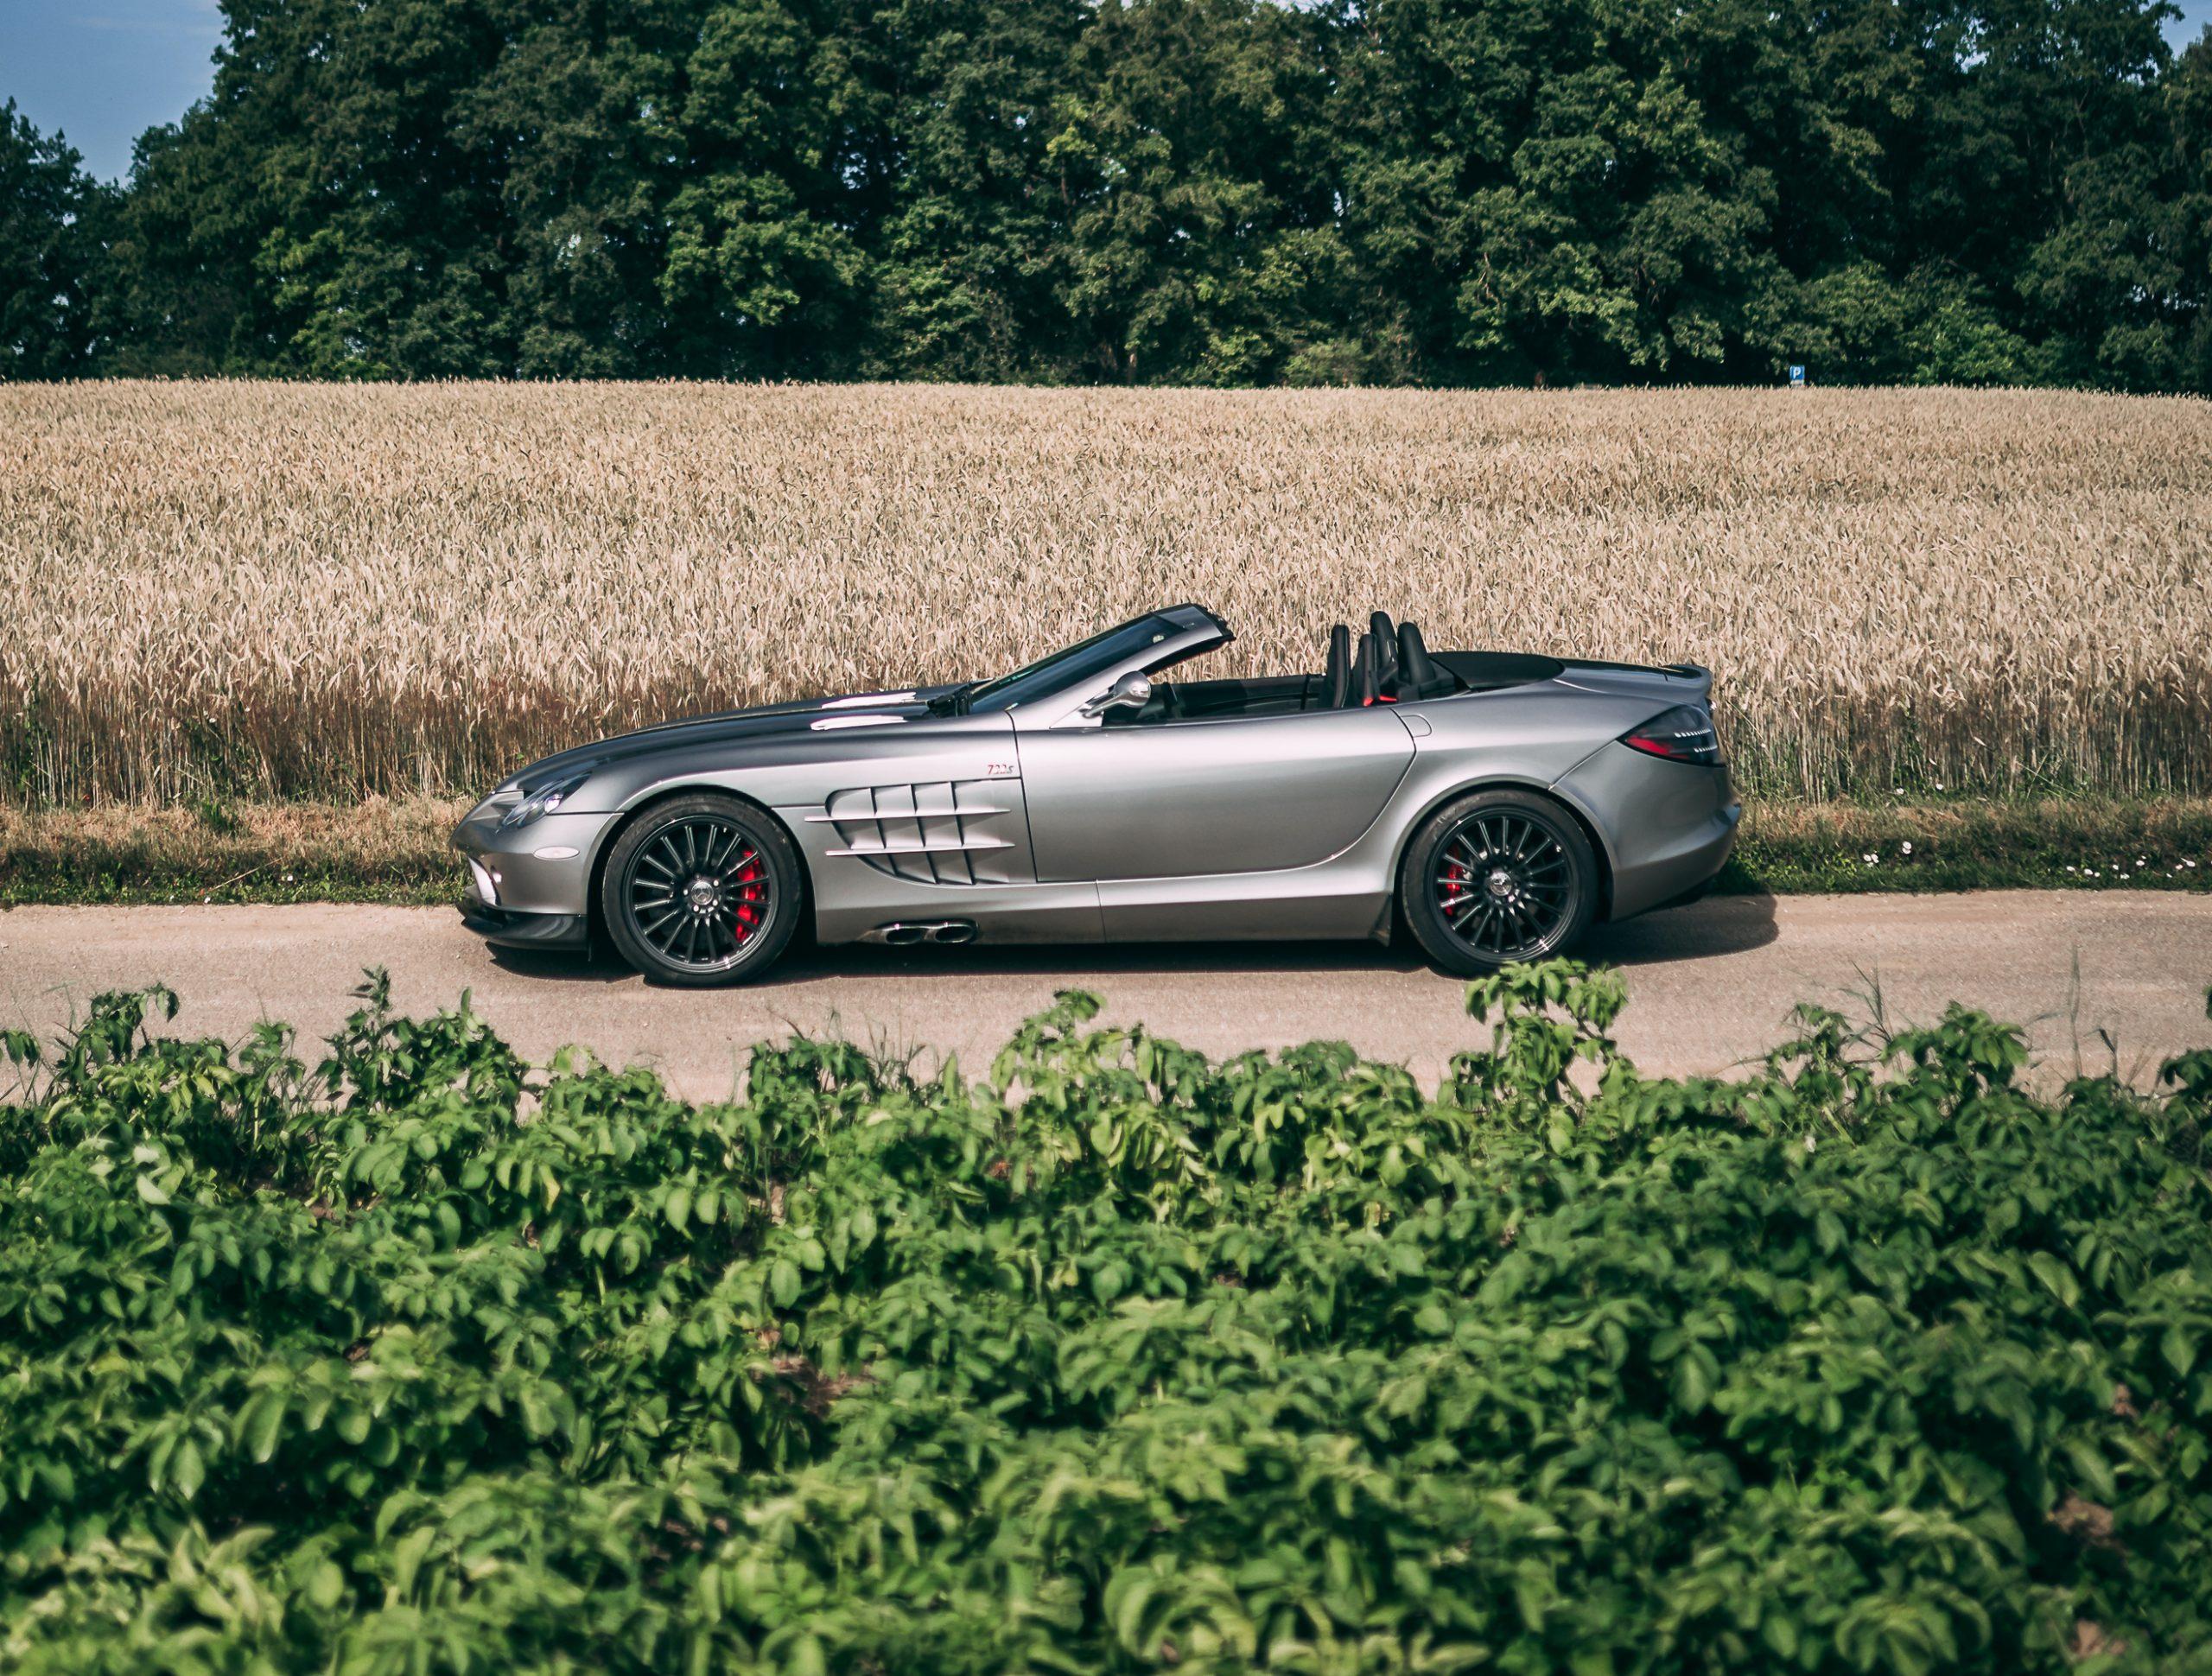 200723 2009 Mercedes-Benz SLR McLaren 722 S Roadster (Credit – Stephan Bauer ©2020 Courtesy of RM Sotheby's)